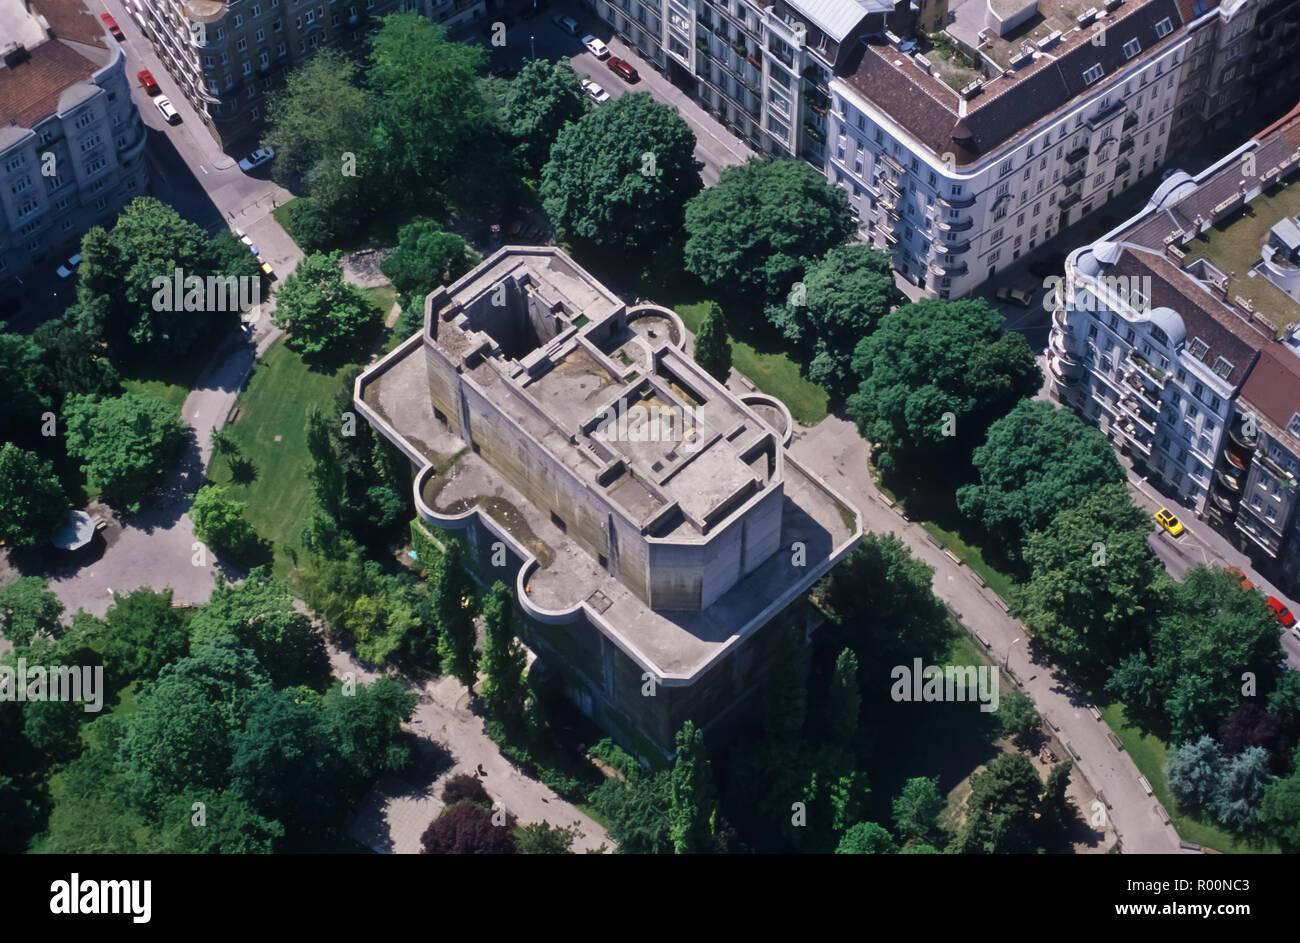 Wien, Flakturm, Feuerleitturm Arenbergpark, Luftbild - Vienna, Flak Tower, Aerial View Stock Photo